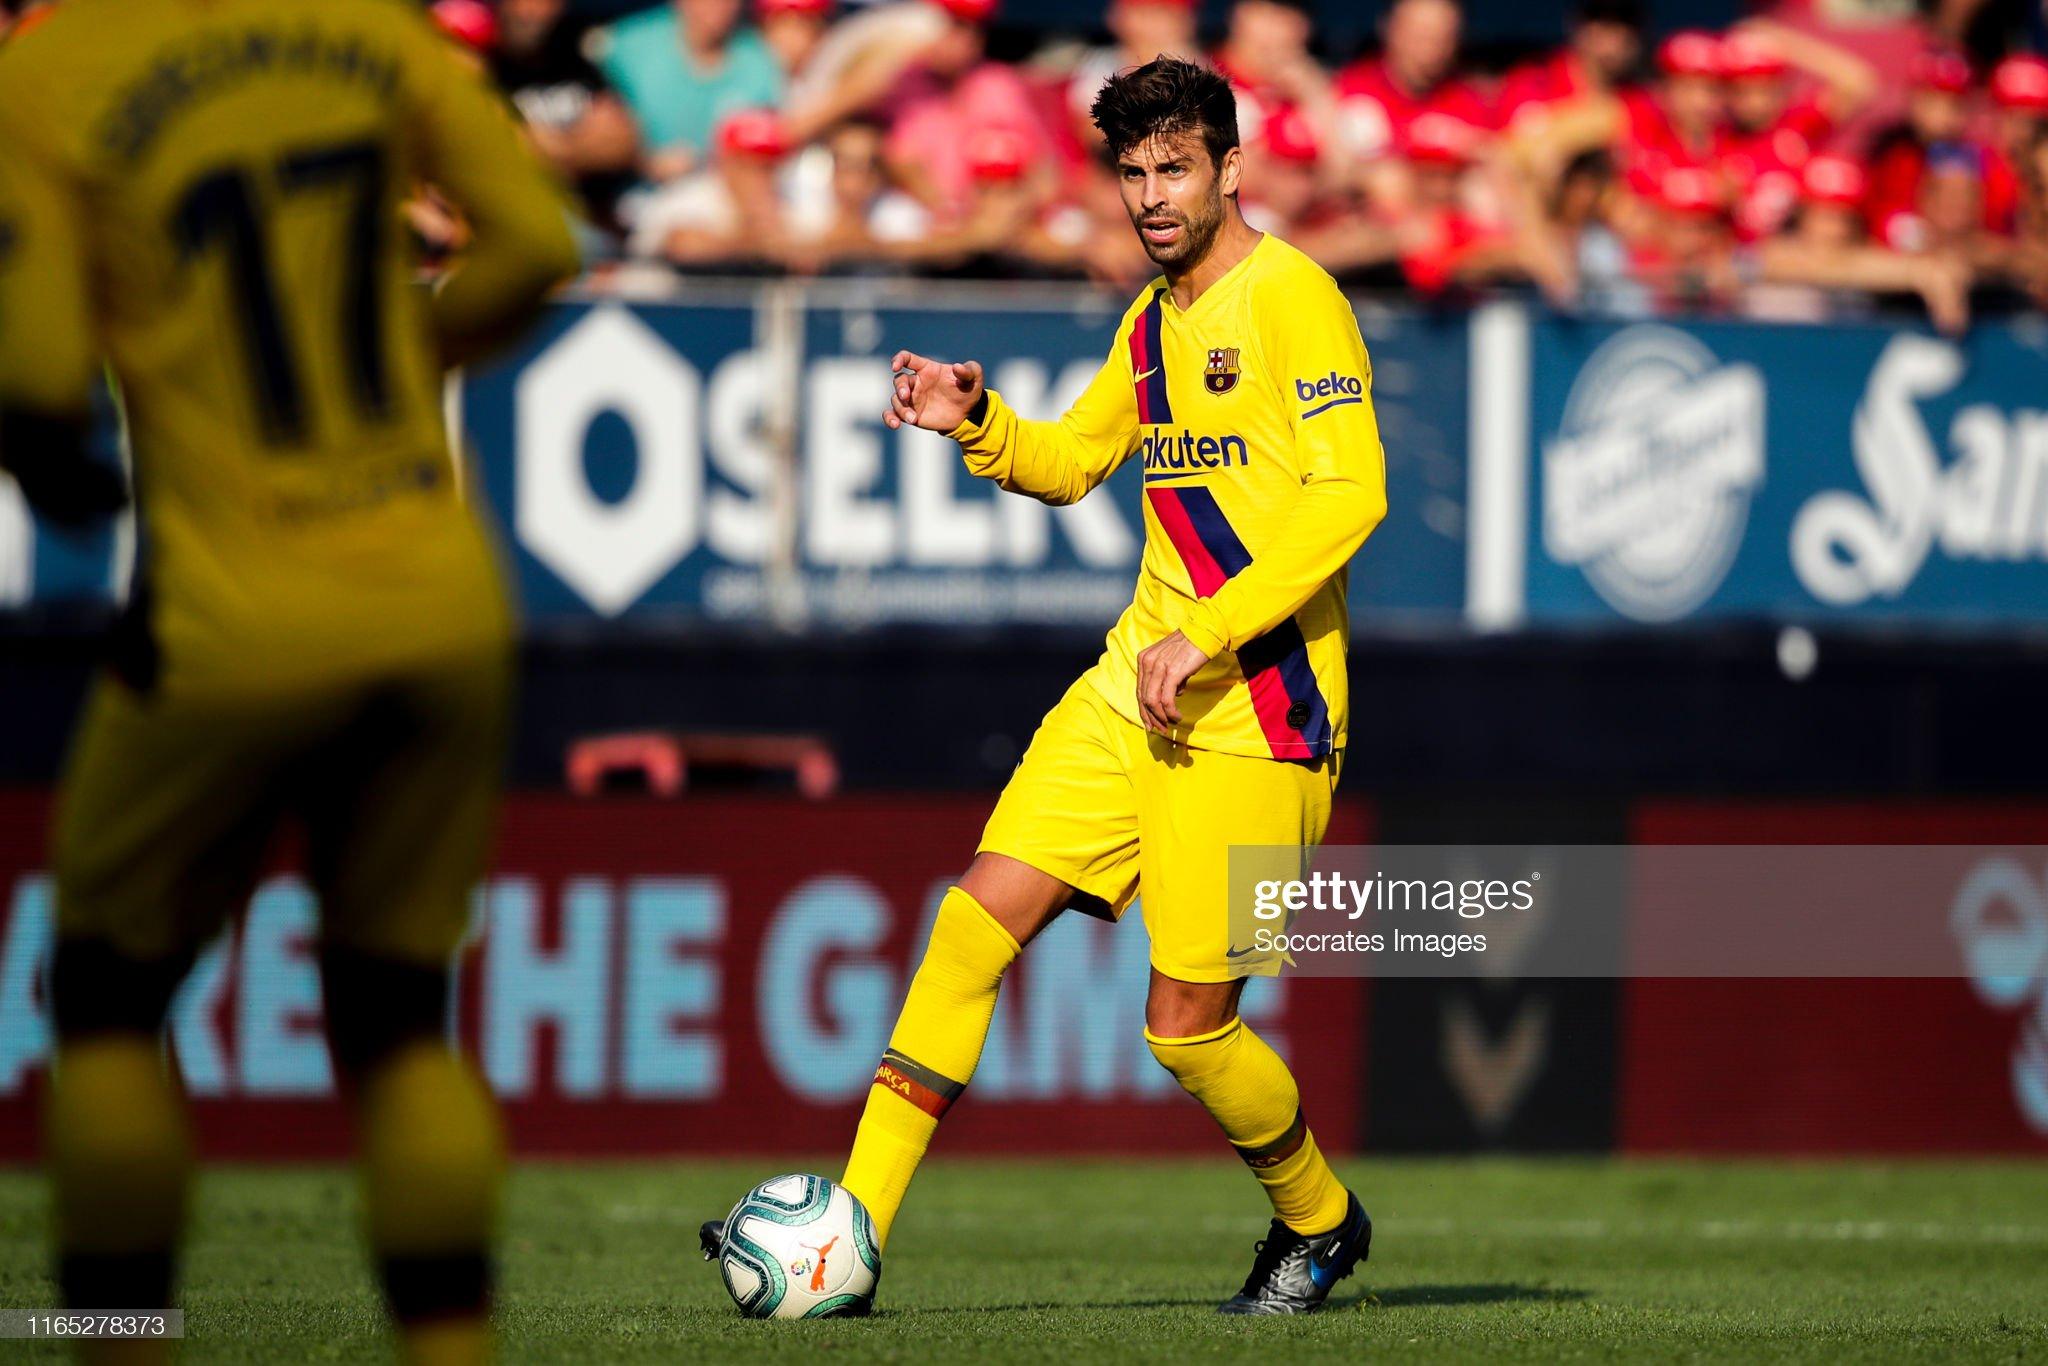 صور مباراة : أوساسونا - برشلونة 2-2 ( 31-08-2019 )  Gerard-pique-of-fc-barcelona-during-the-la-liga-santander-match-v-picture-id1165278373?s=2048x2048